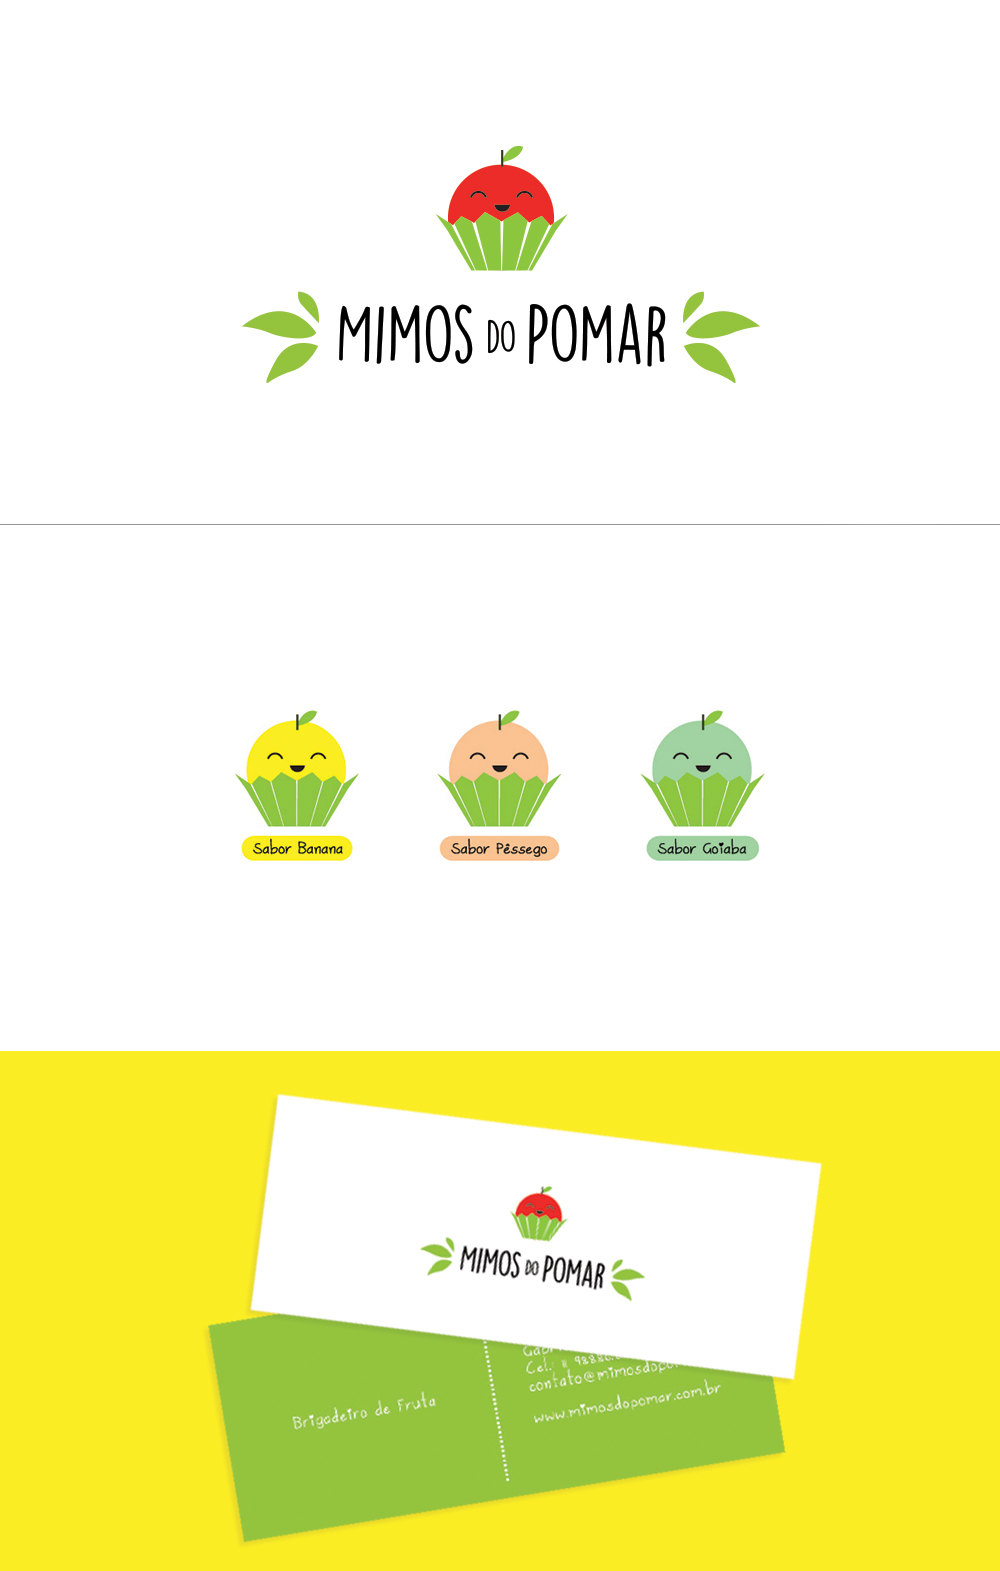 mimos-do-pomar-logo.jpg